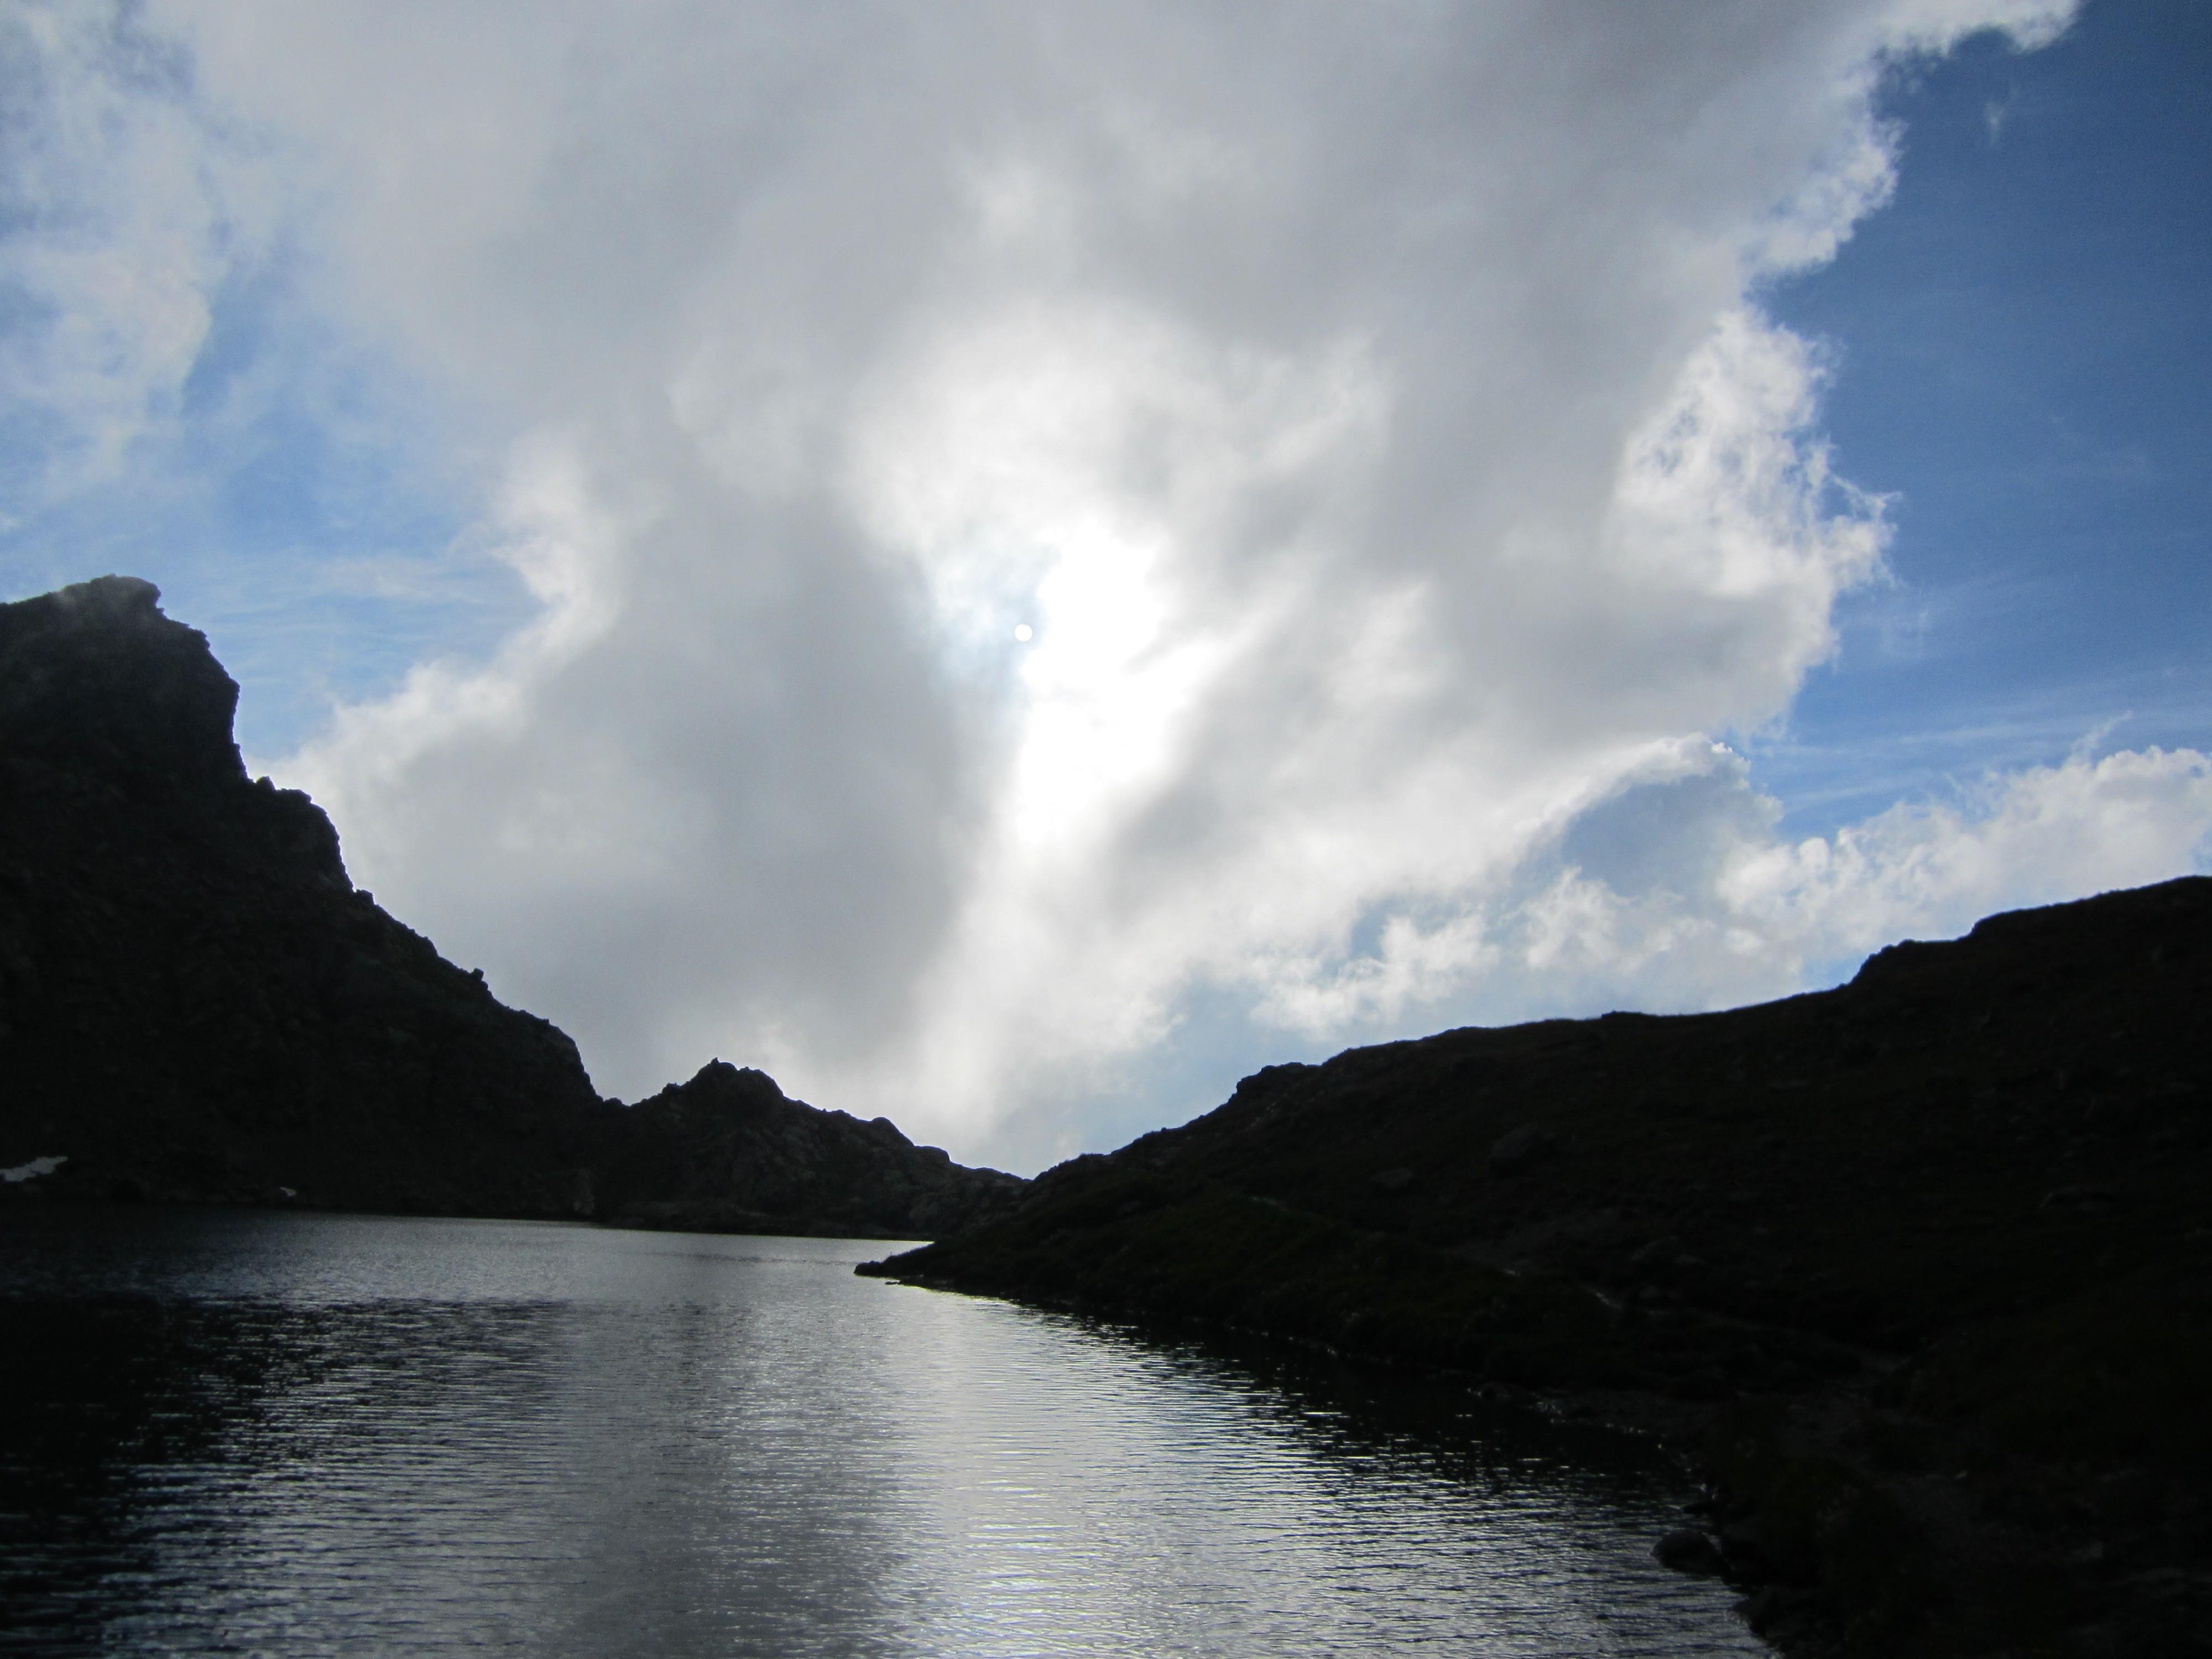 Caroline Mugnier - French Alps: Contrastes saisissants en Belledonne - Ma Vie Francaise - My French Life - www.MyFrenchLife.org